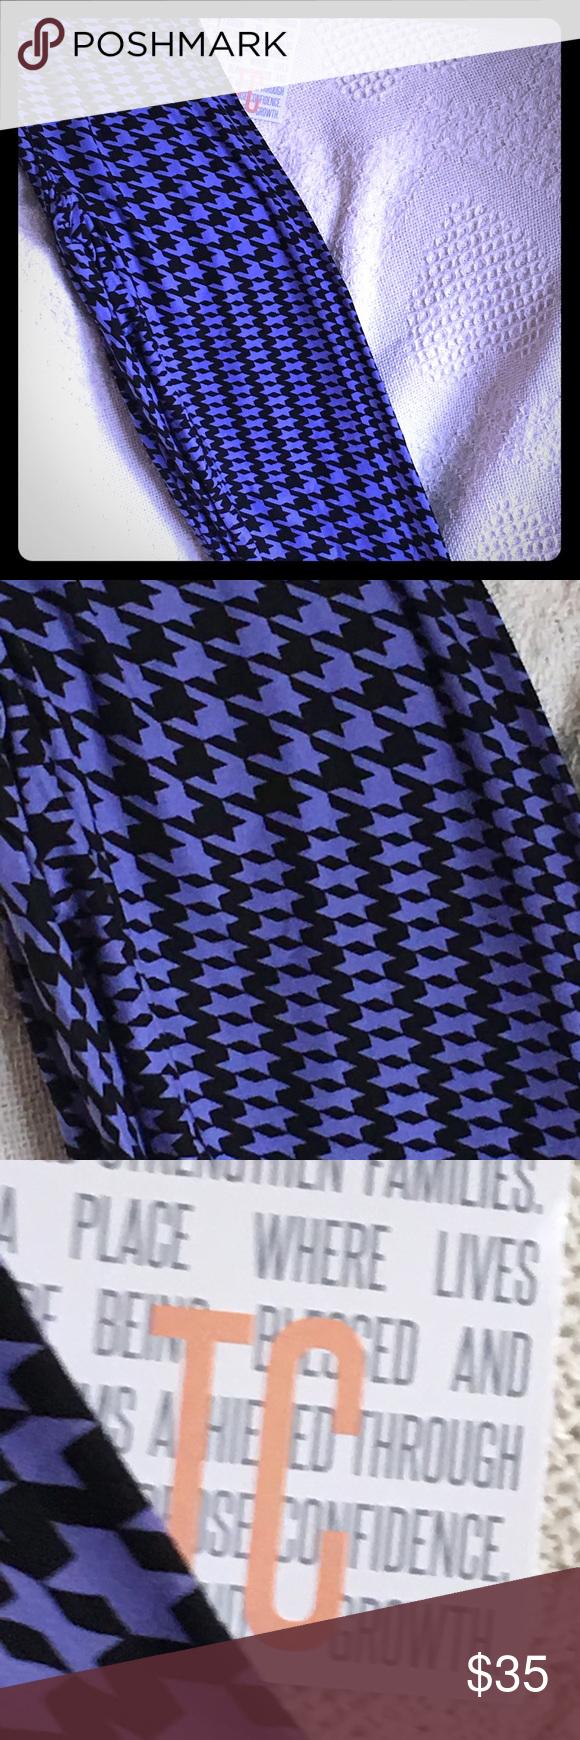 6fcc764b5ce5ac Lularoe Leggings TC New LLR TC houndstooth burpee color. (Between a blue  and purple). NWT LuLaRoe Pants Leggings